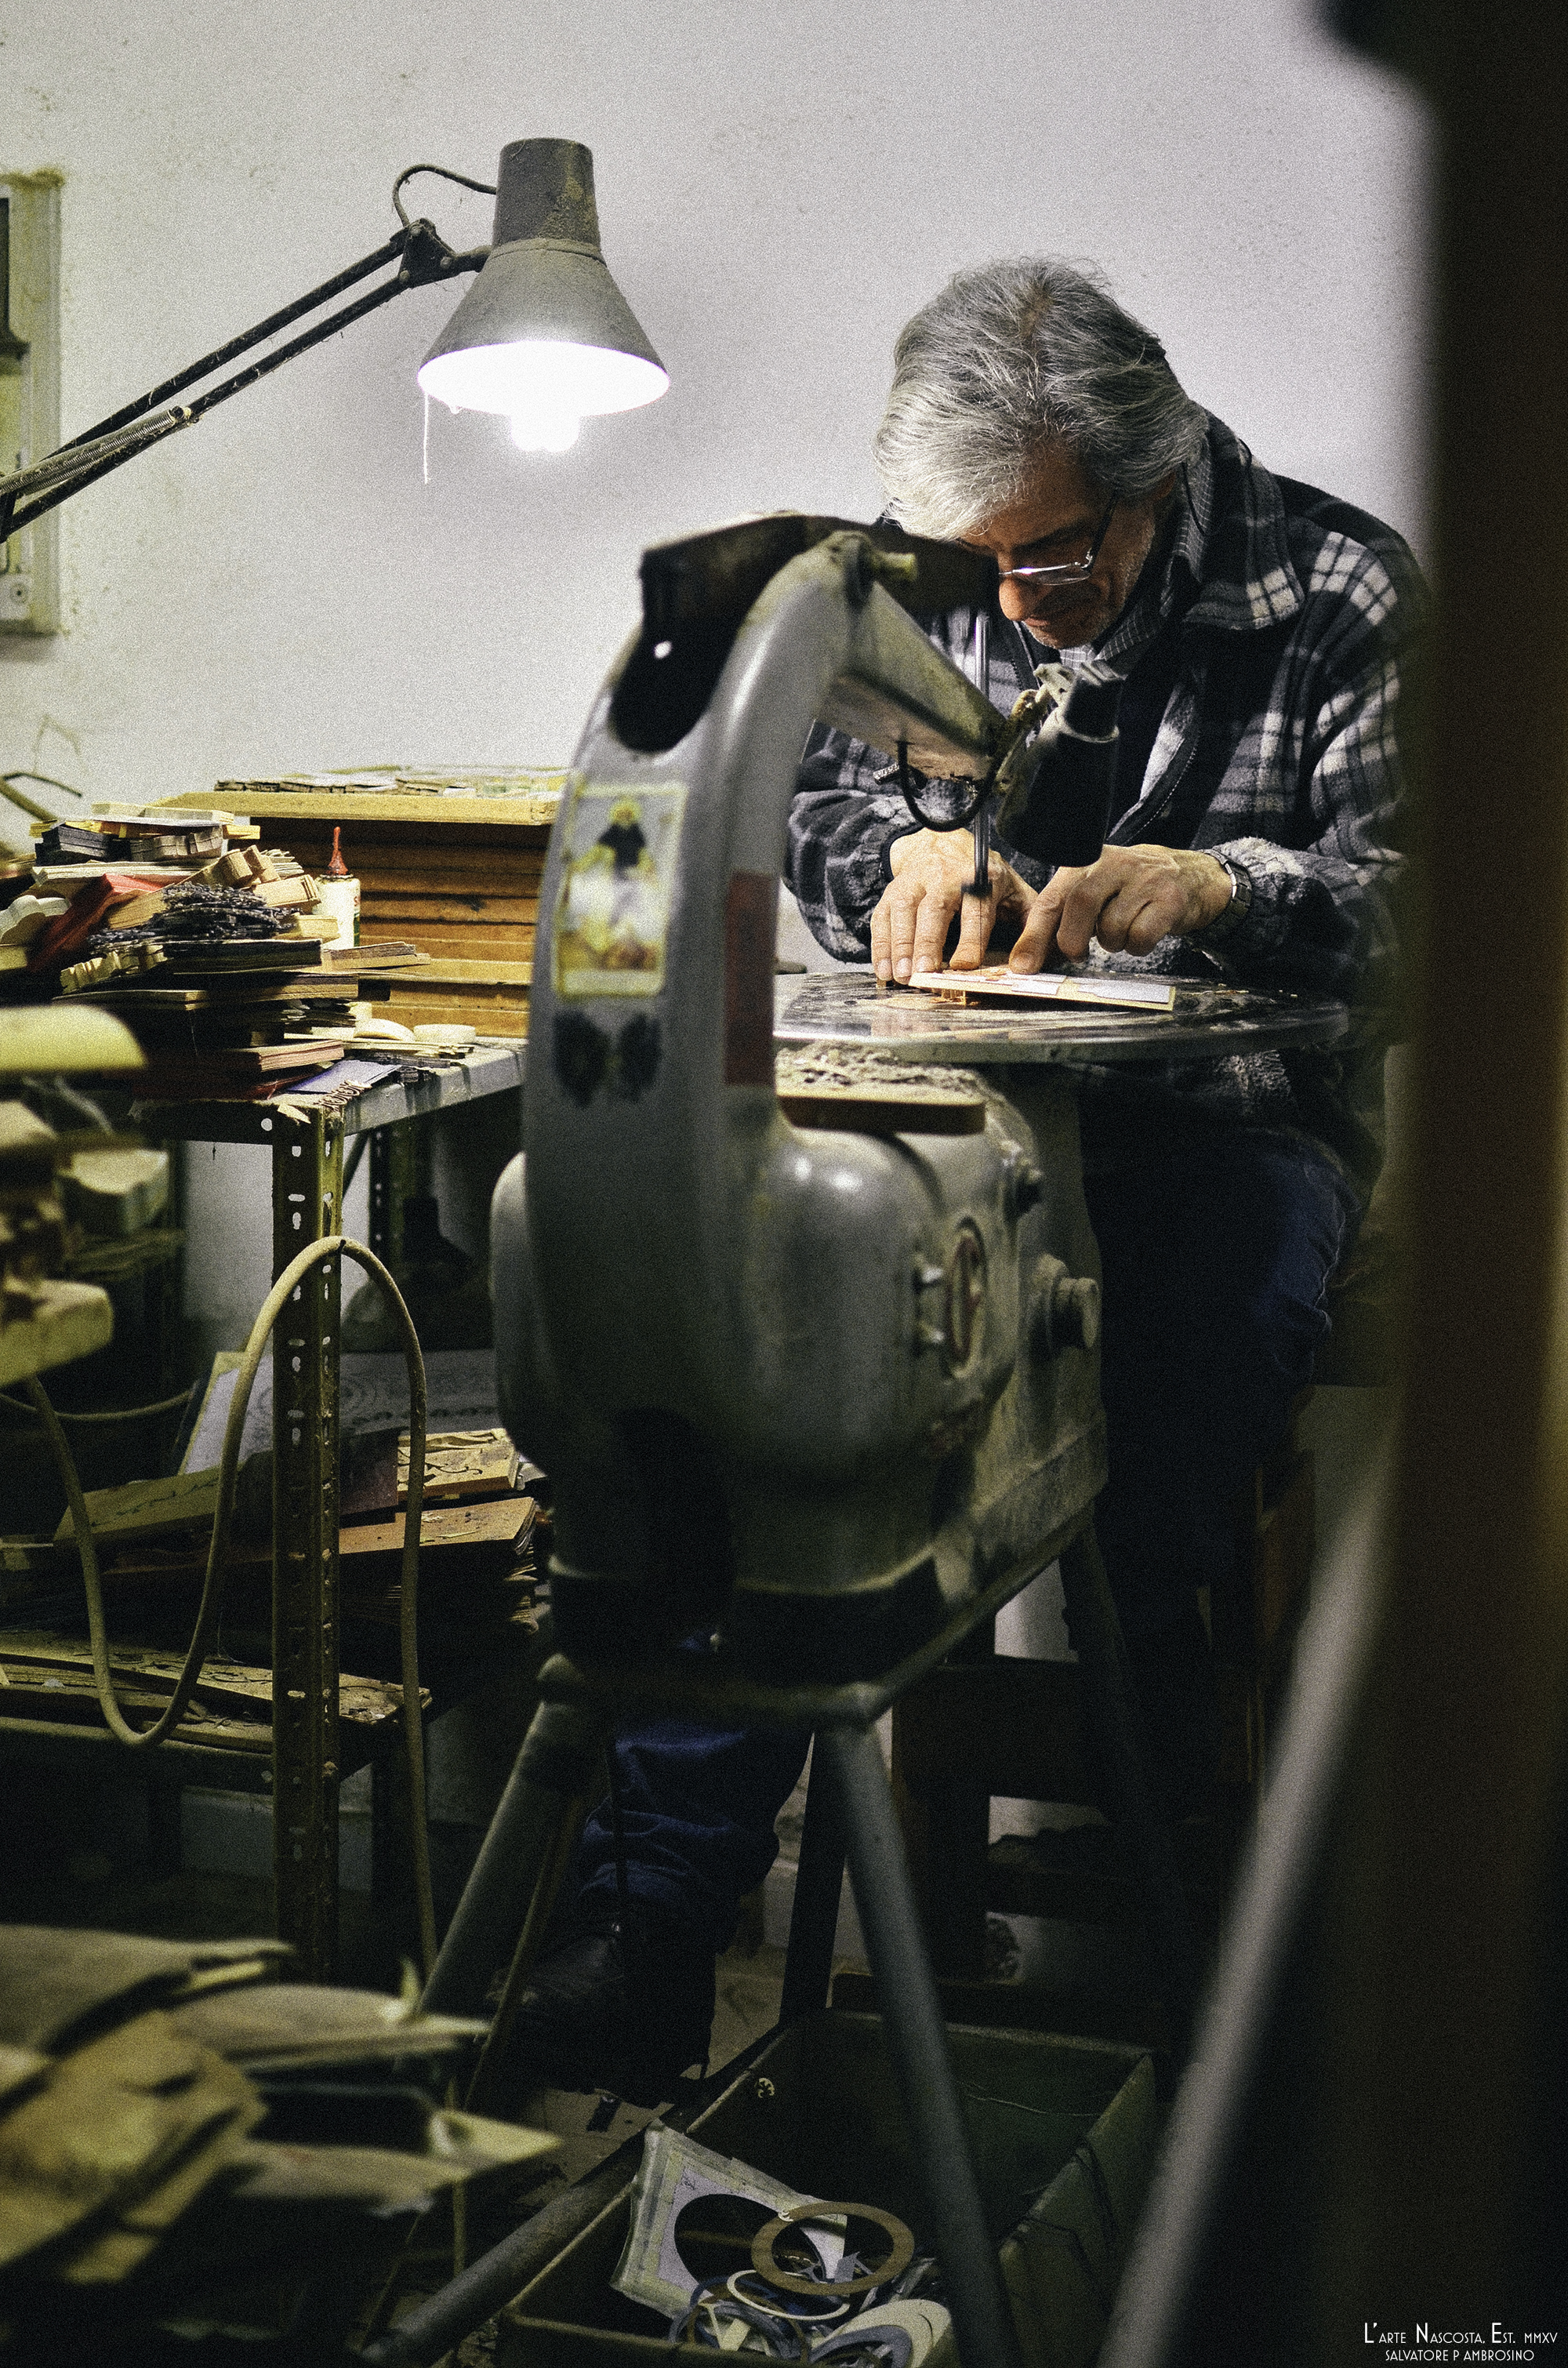 Pasquale Famiani - Intarsiatore (Marquetry Craftsman)  , Sorrento